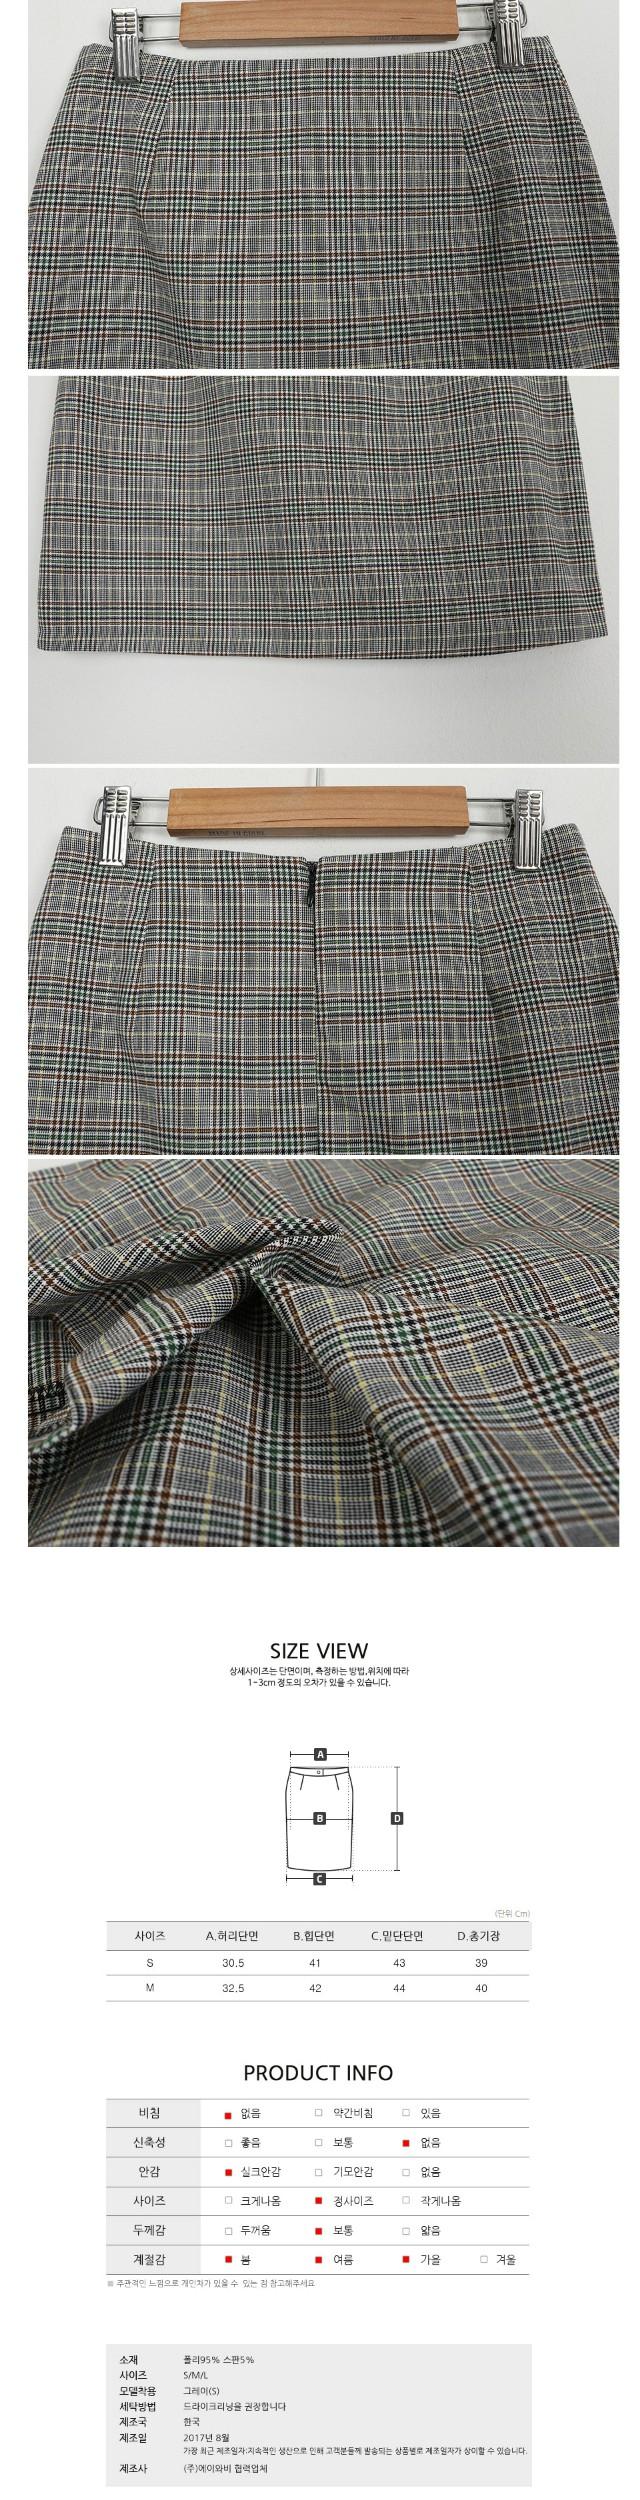 Pew check mini skirt